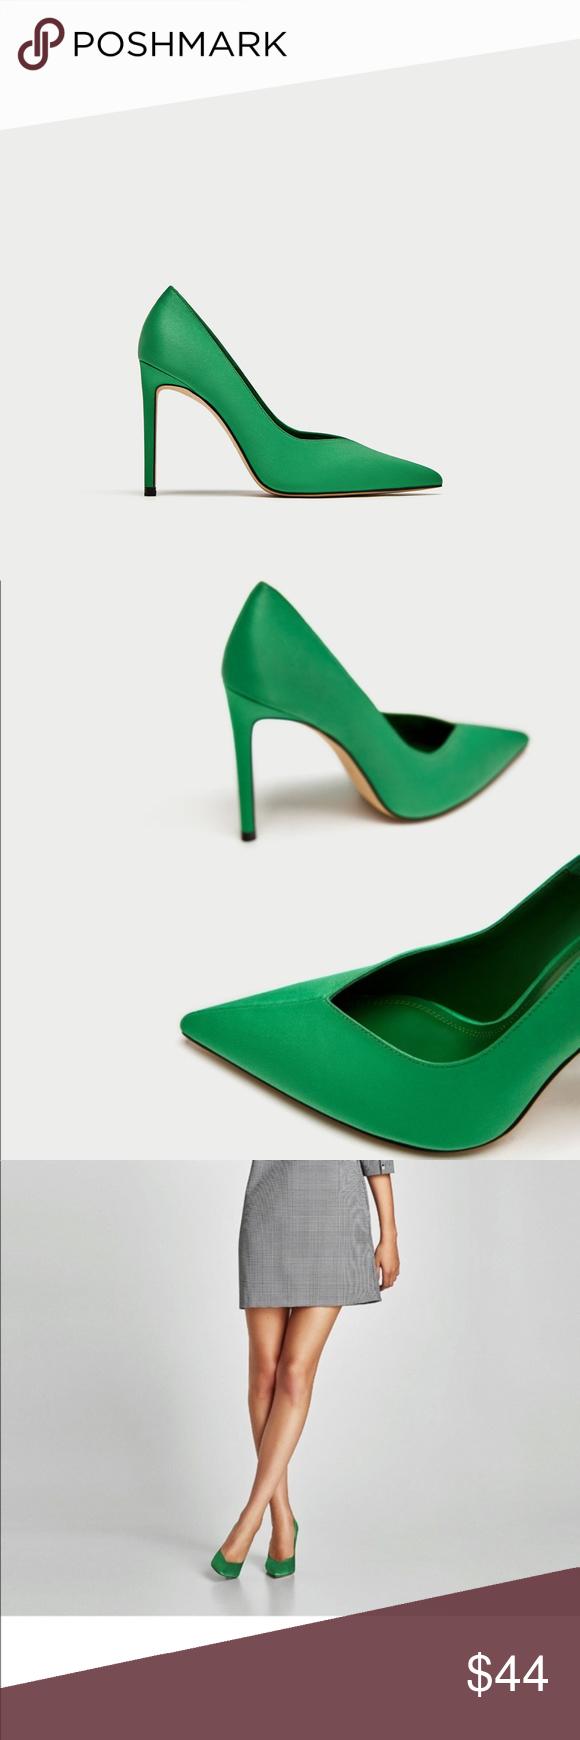 Zara Green V Vamp High Heel Shoes New With A Tag Green V Vamp High Heel Court Shoes From Zara Size 37 And 36 Run Half Size Smal Shoes Green High Heels Heels